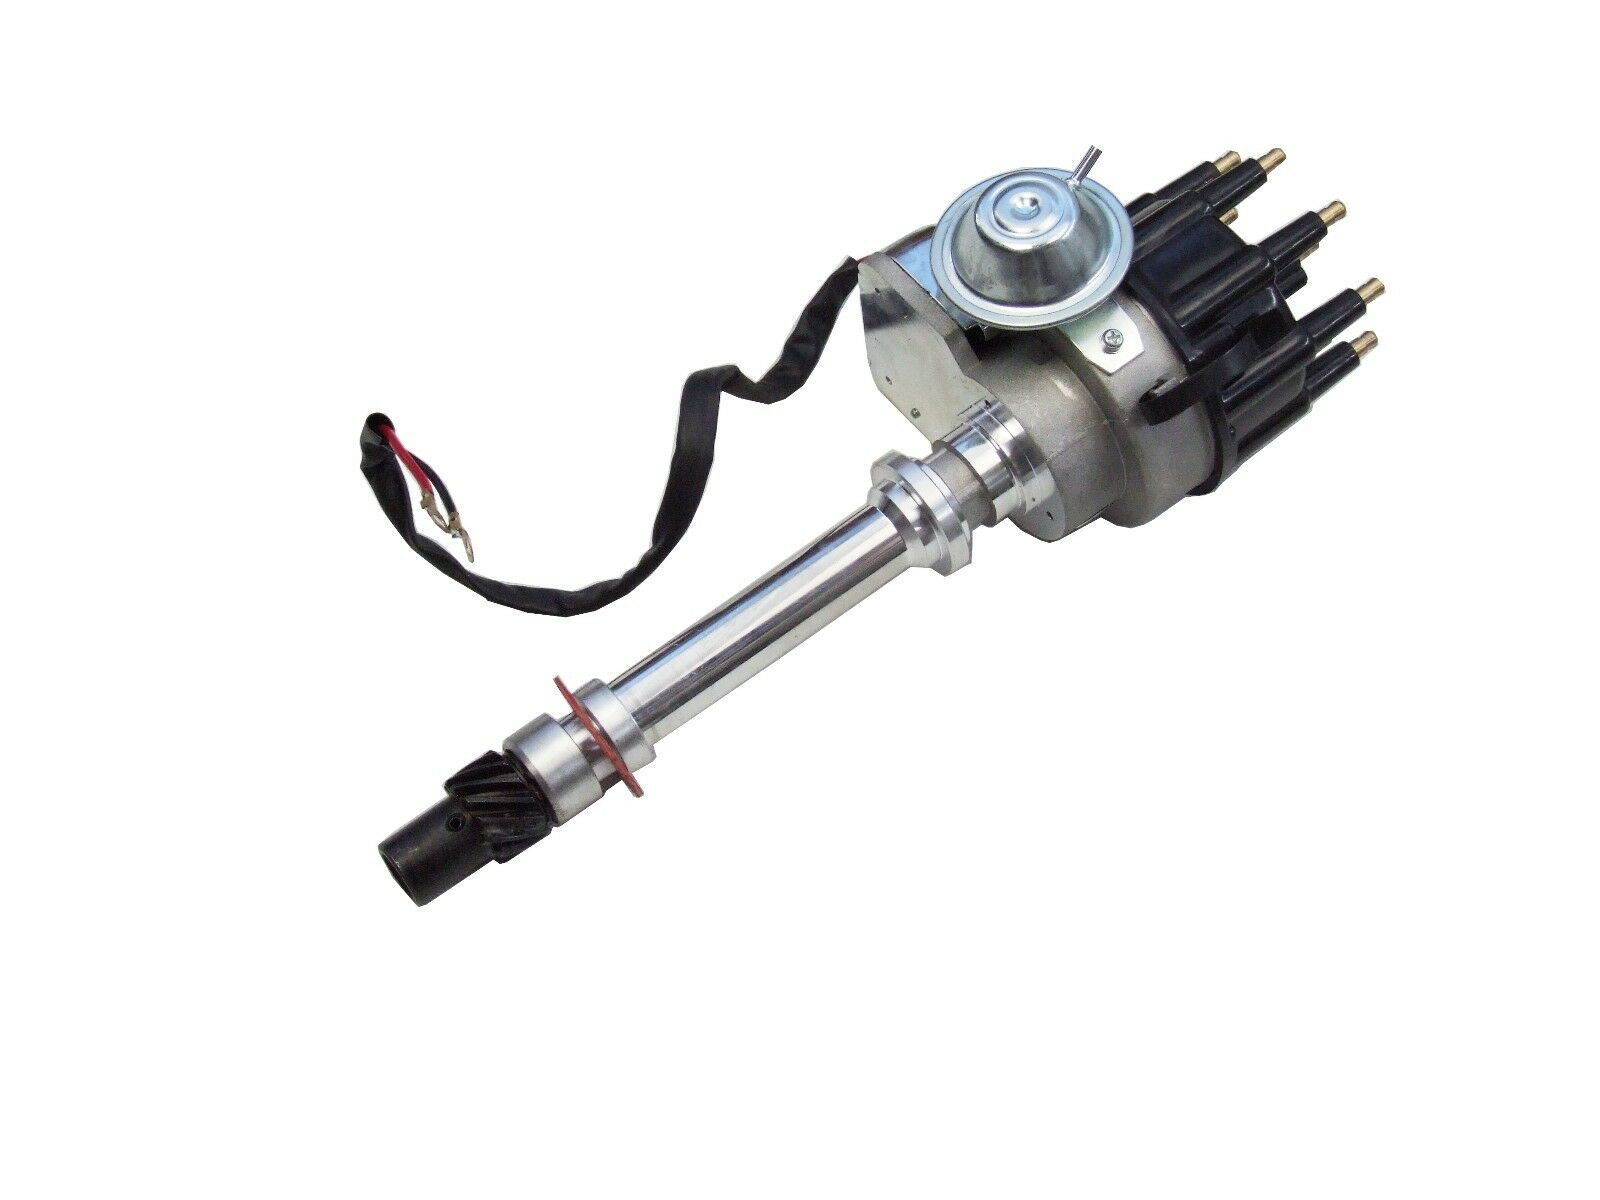 hei distributor wiring diagram chevy 350 remote start ford sbc bbc v8 ready to go 454